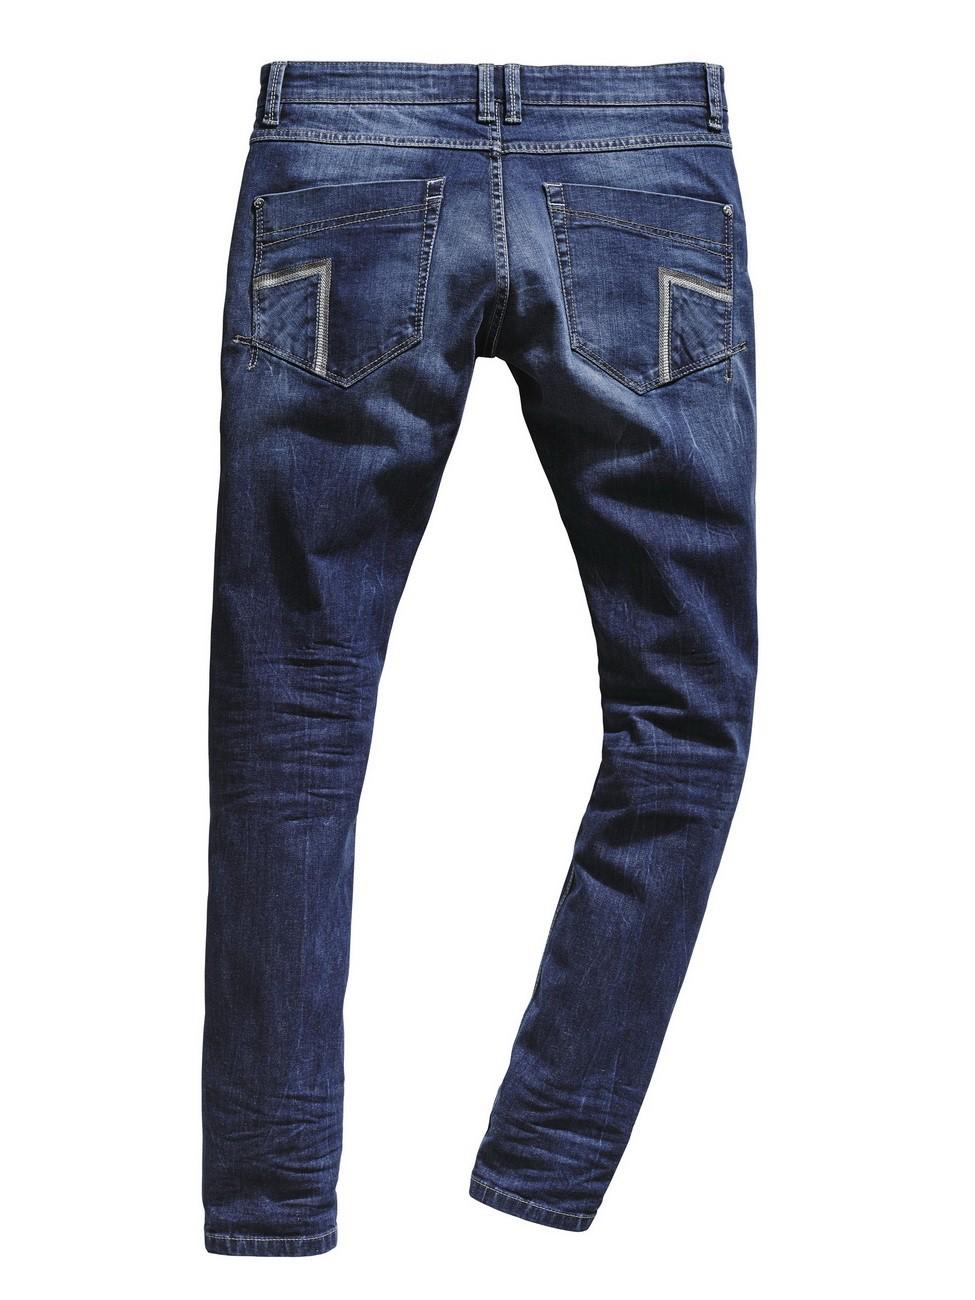 timezone-herren-jeans-edotz-slim-fit-surfer-wash